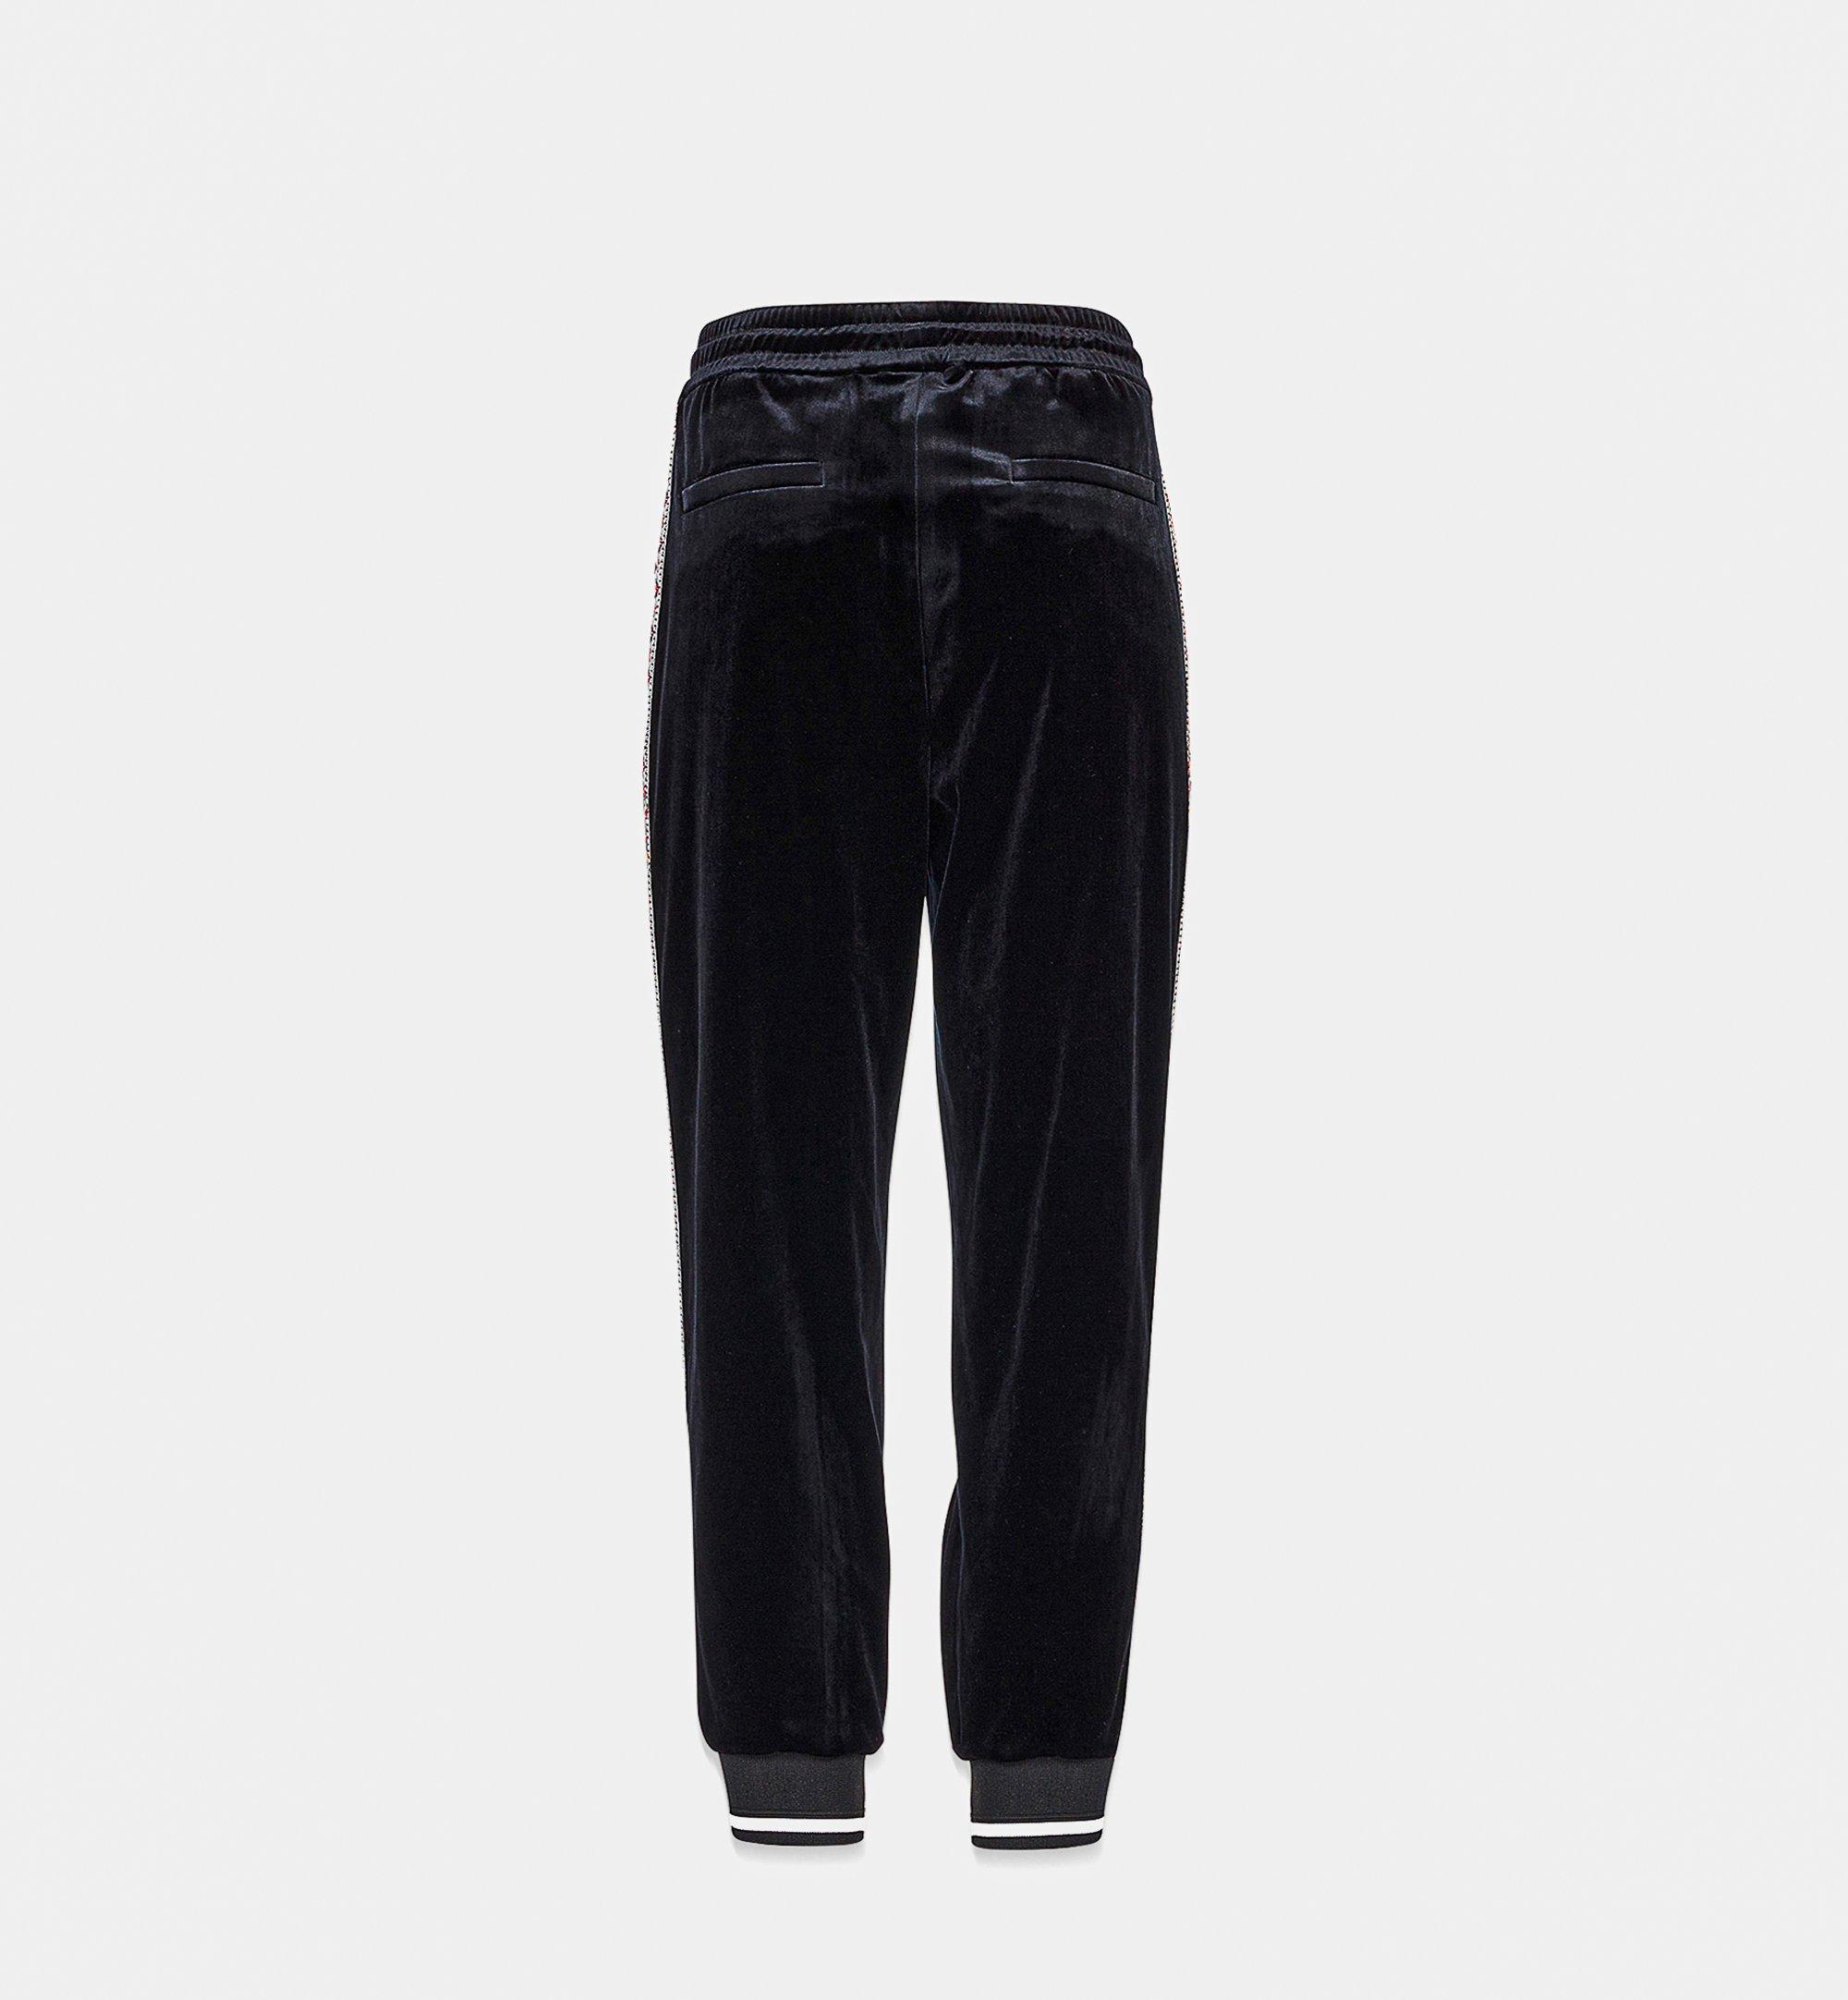 MCM Geo月桂叶丝绒运动裤 Black MHPBSMM04BK00M 更多视角 1